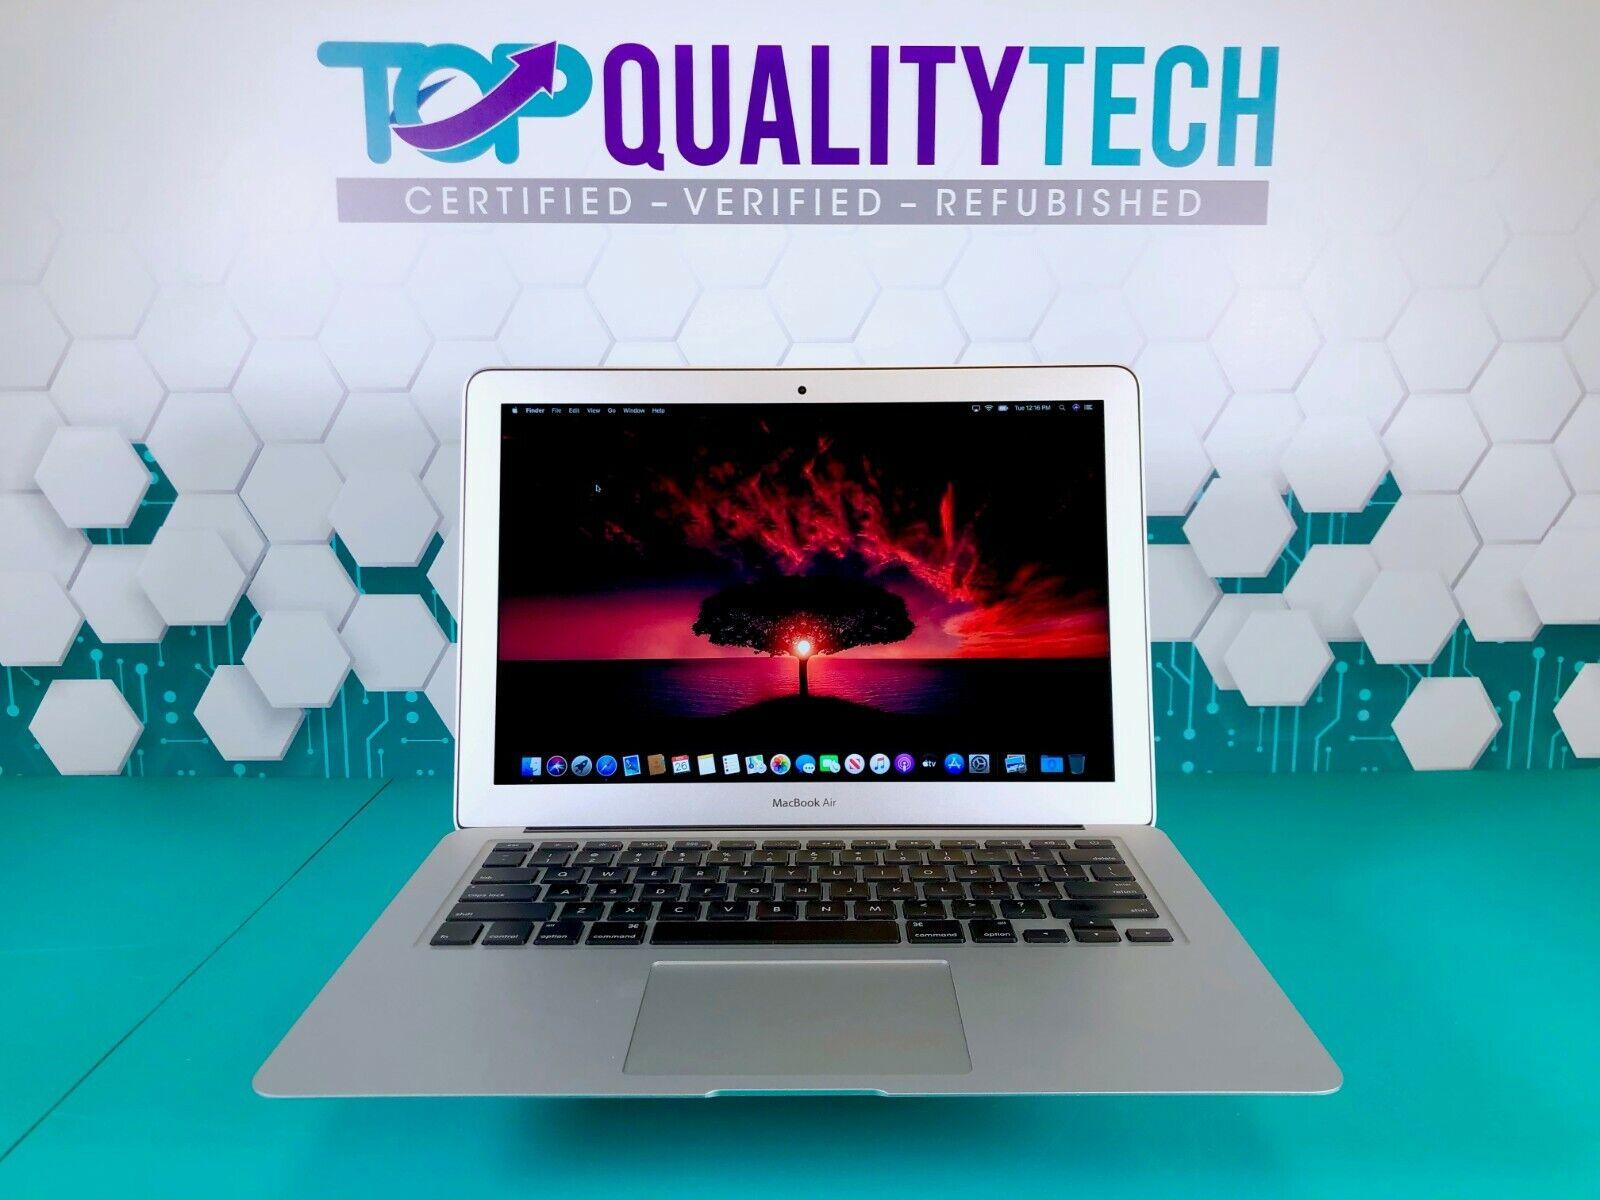 Apple MacBook Air 13 inch Laptop / 3 YEAR WARRANTY / 256GB SSD + BONUS / OS-2018. Buy it now for 749.00